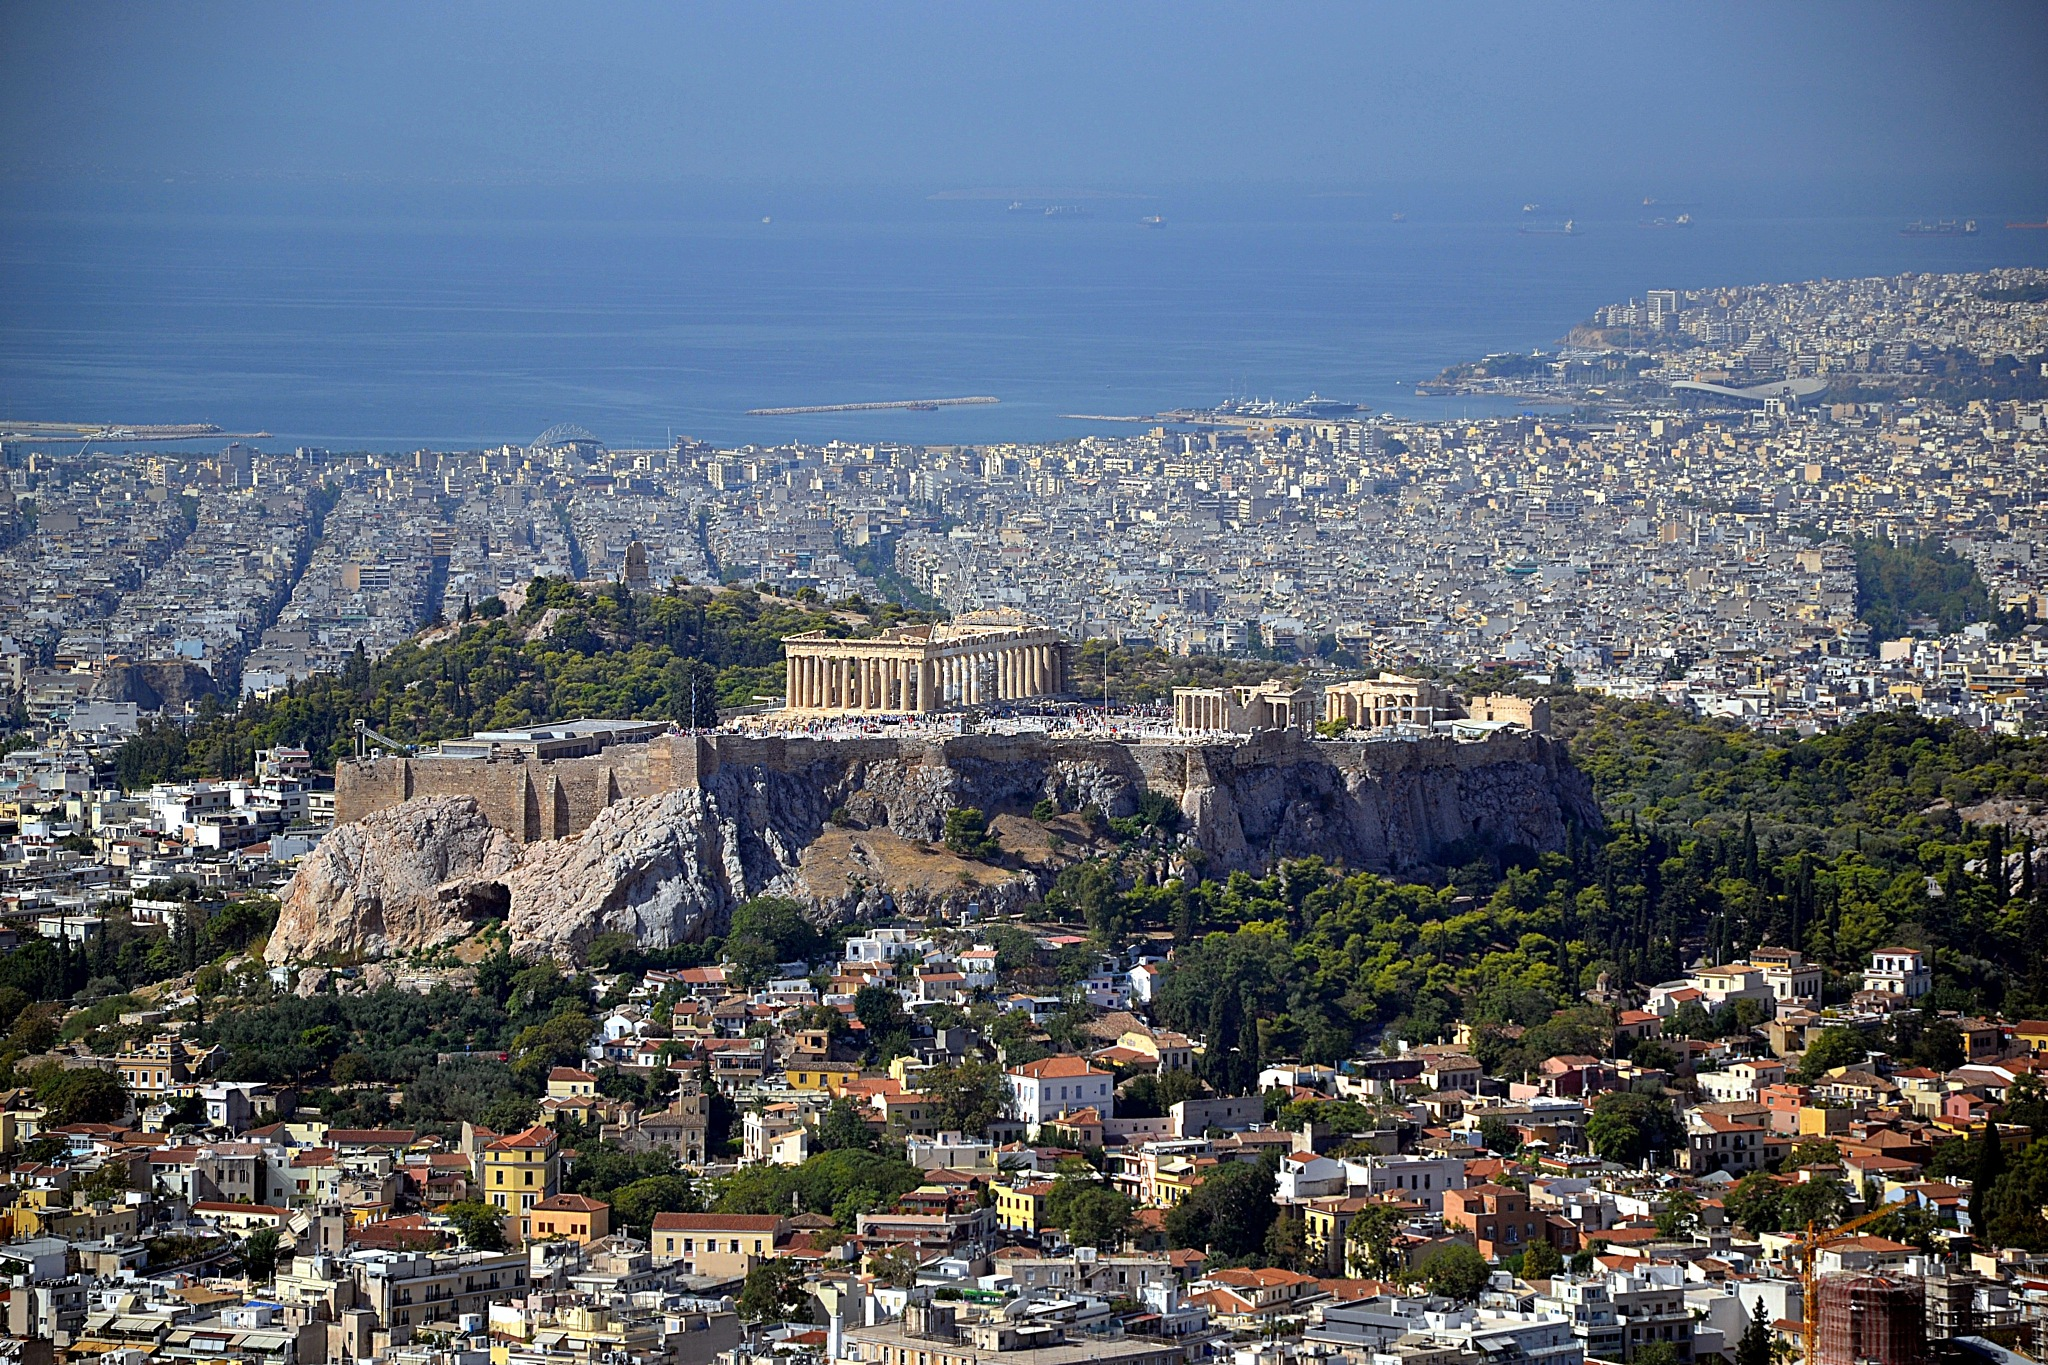 Athens by Seaocea